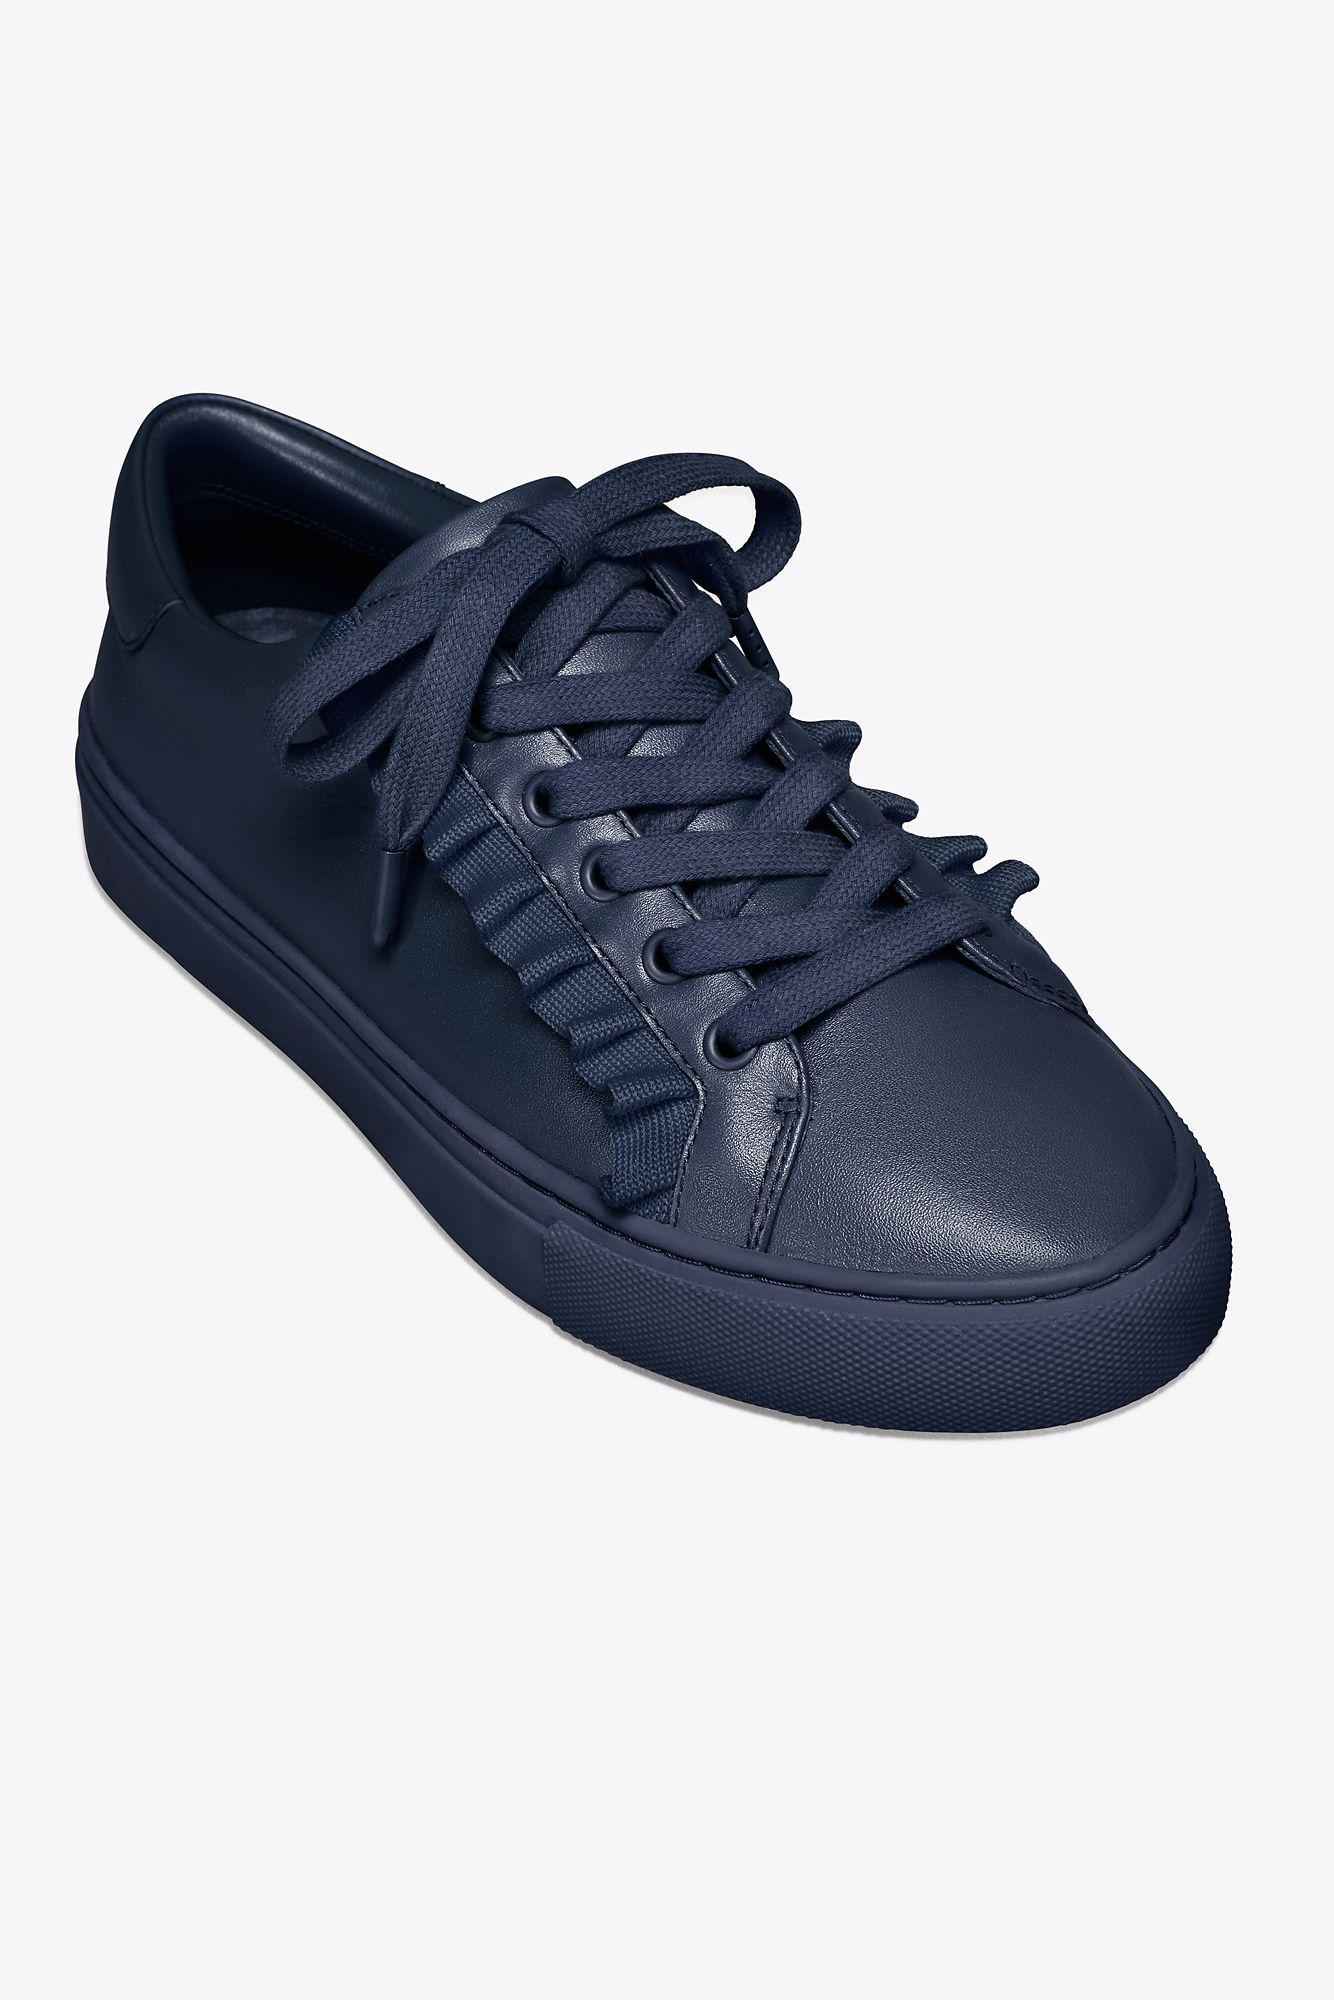 Leather Tory Burch Ruffle Sneaker